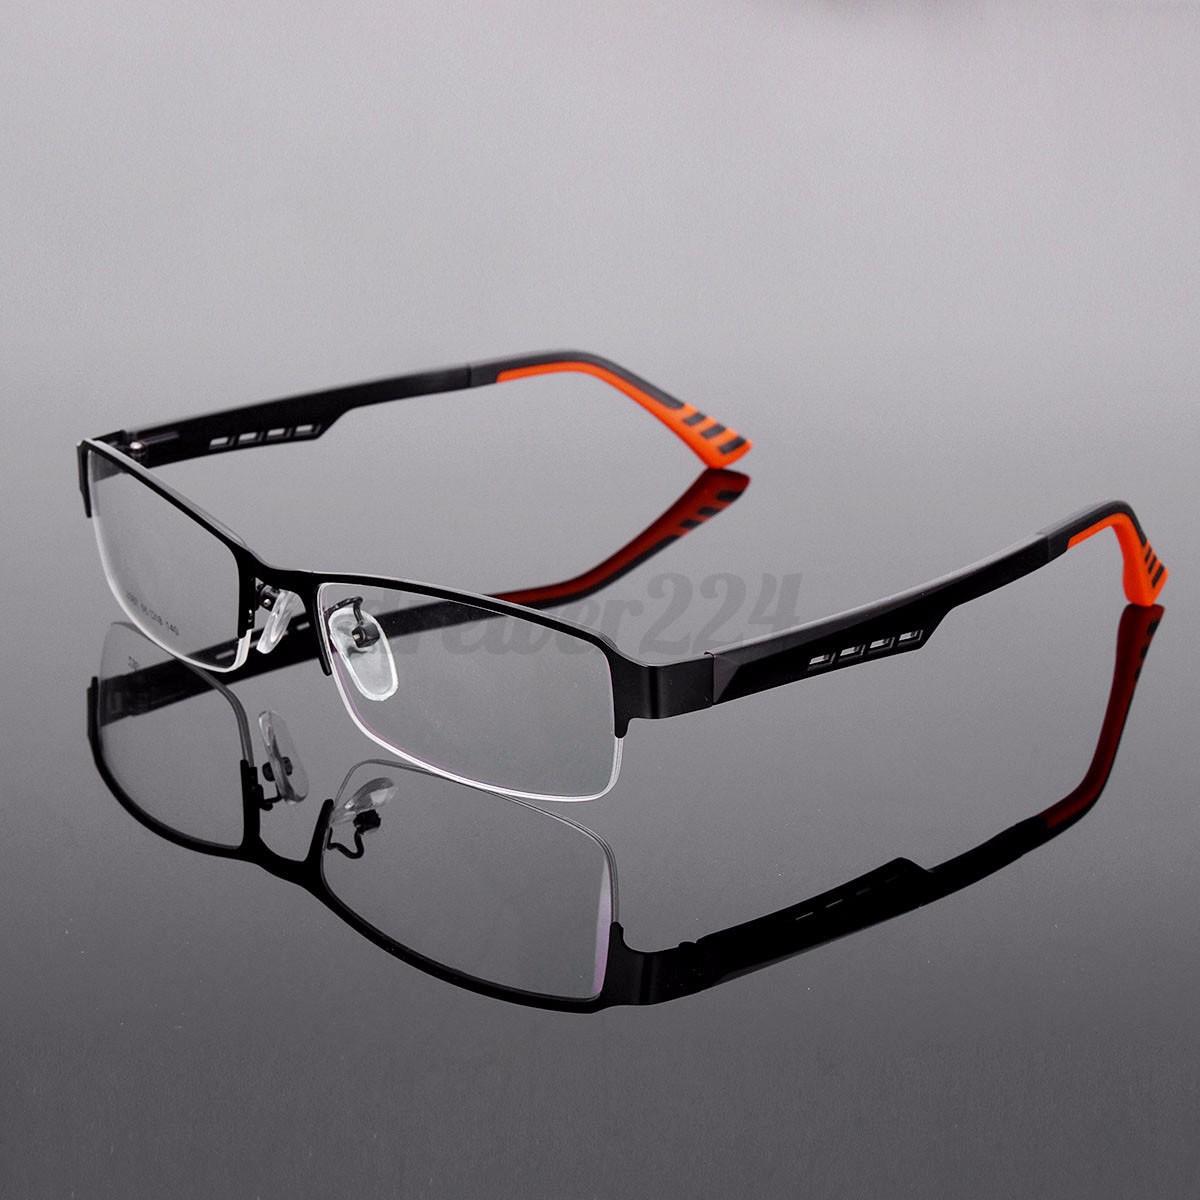 Rimless Wire Glasses : Rimless Wire Frame Eyeglasses Louisiana Bucket Brigade